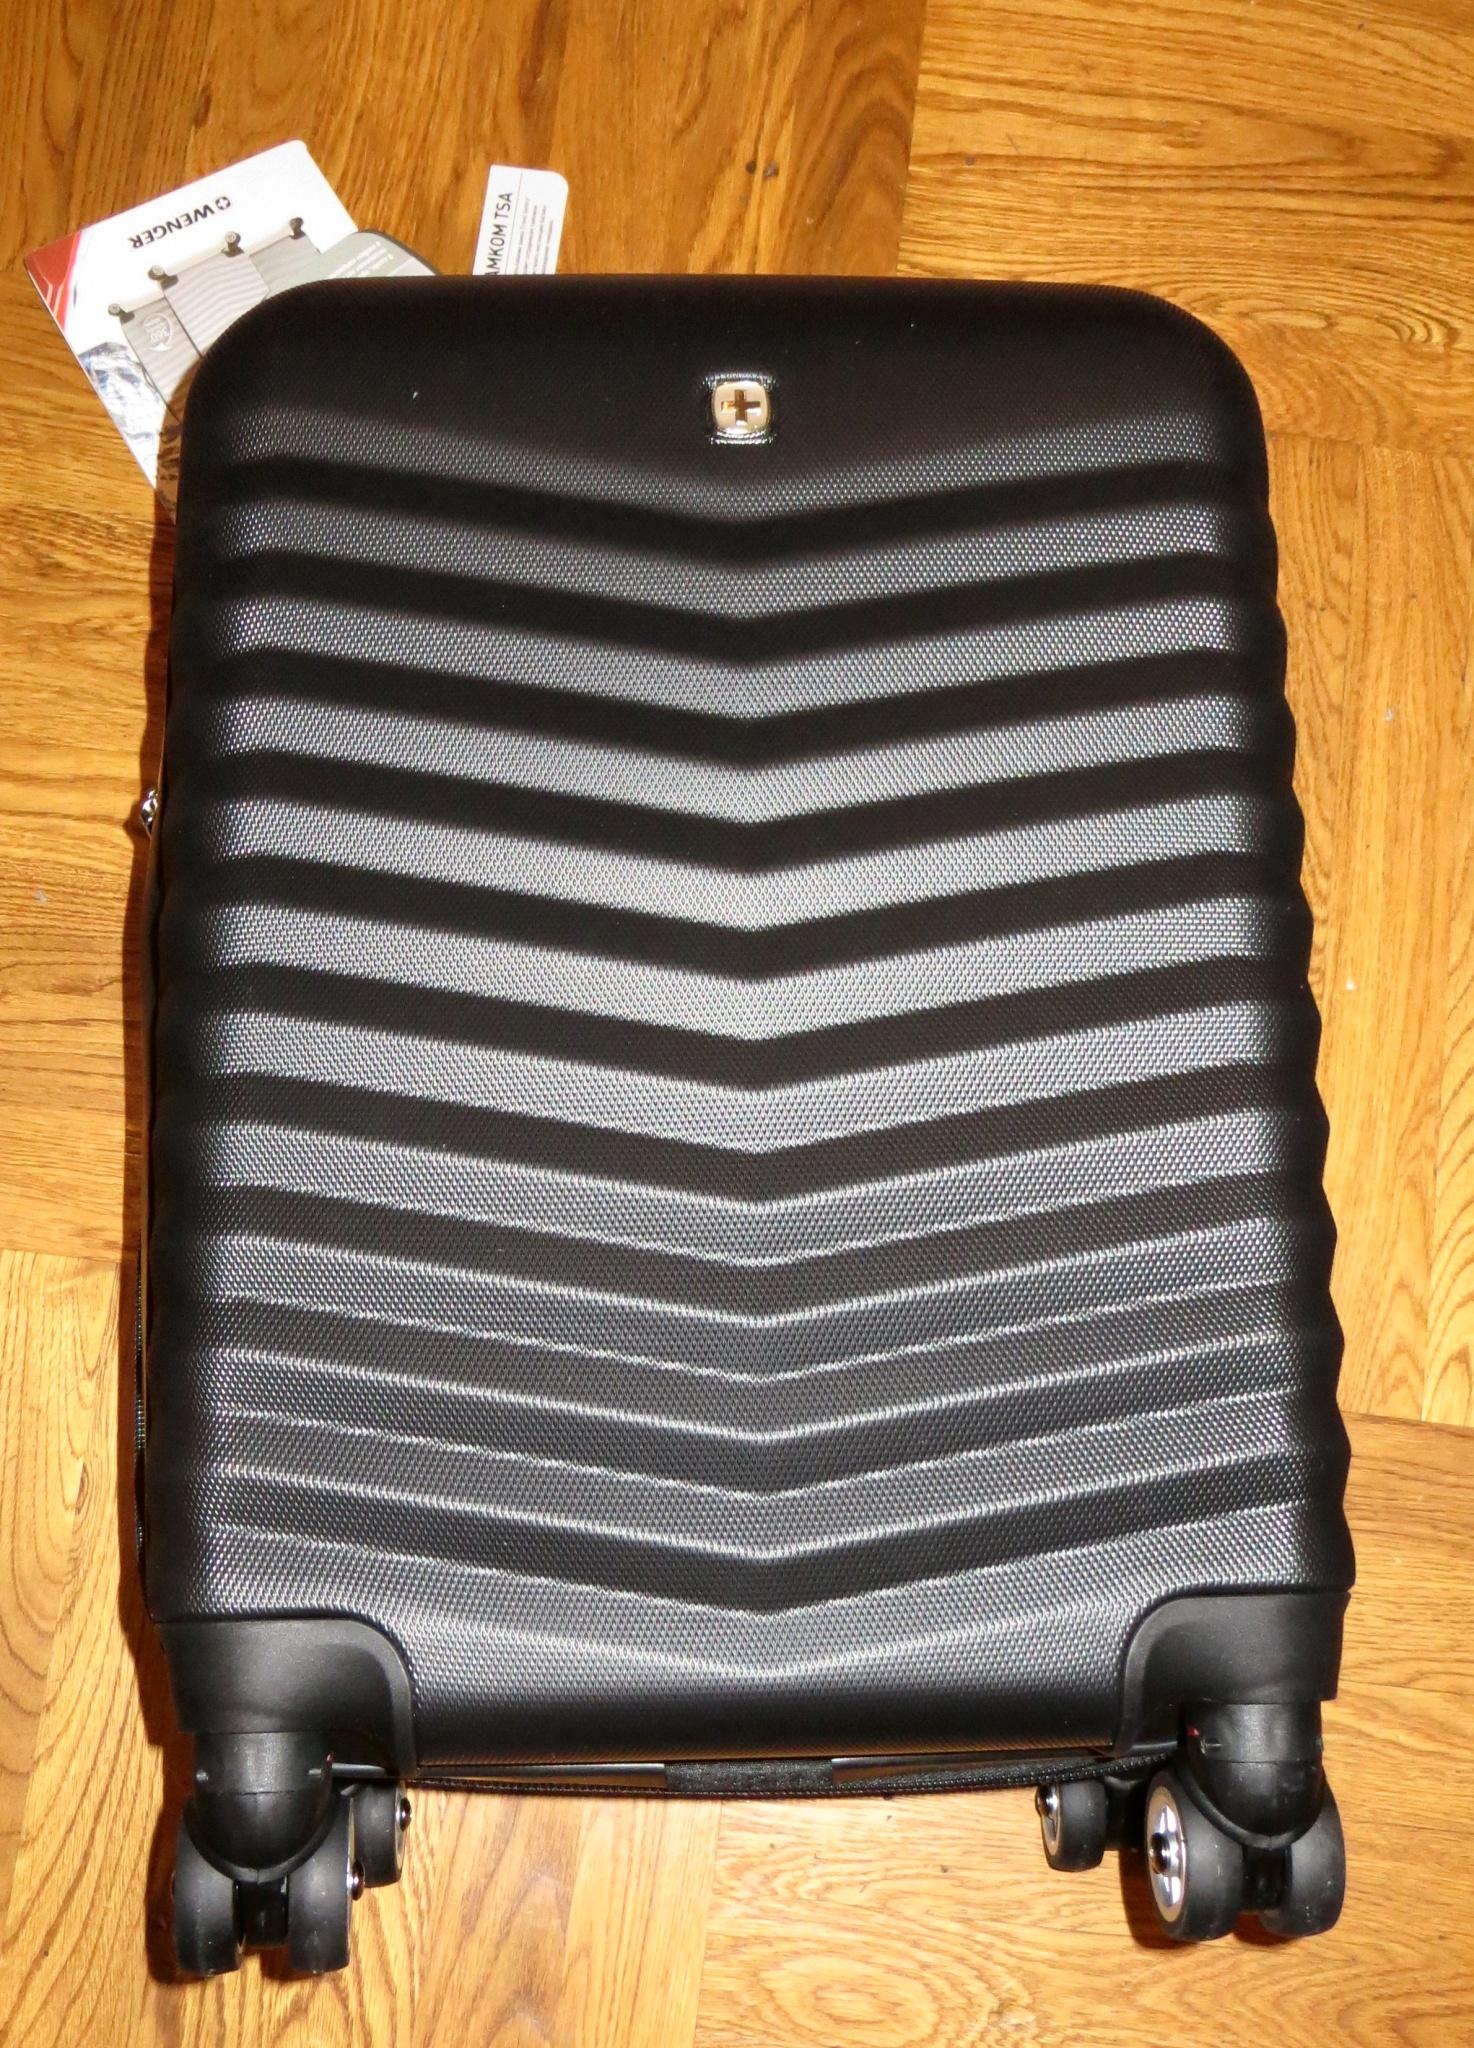 Обзор на Чемодан WENGER FRIBOURG SW32300252, чёрный, АБС-пластик, 33x23x55  см, 5ca5ae69f36